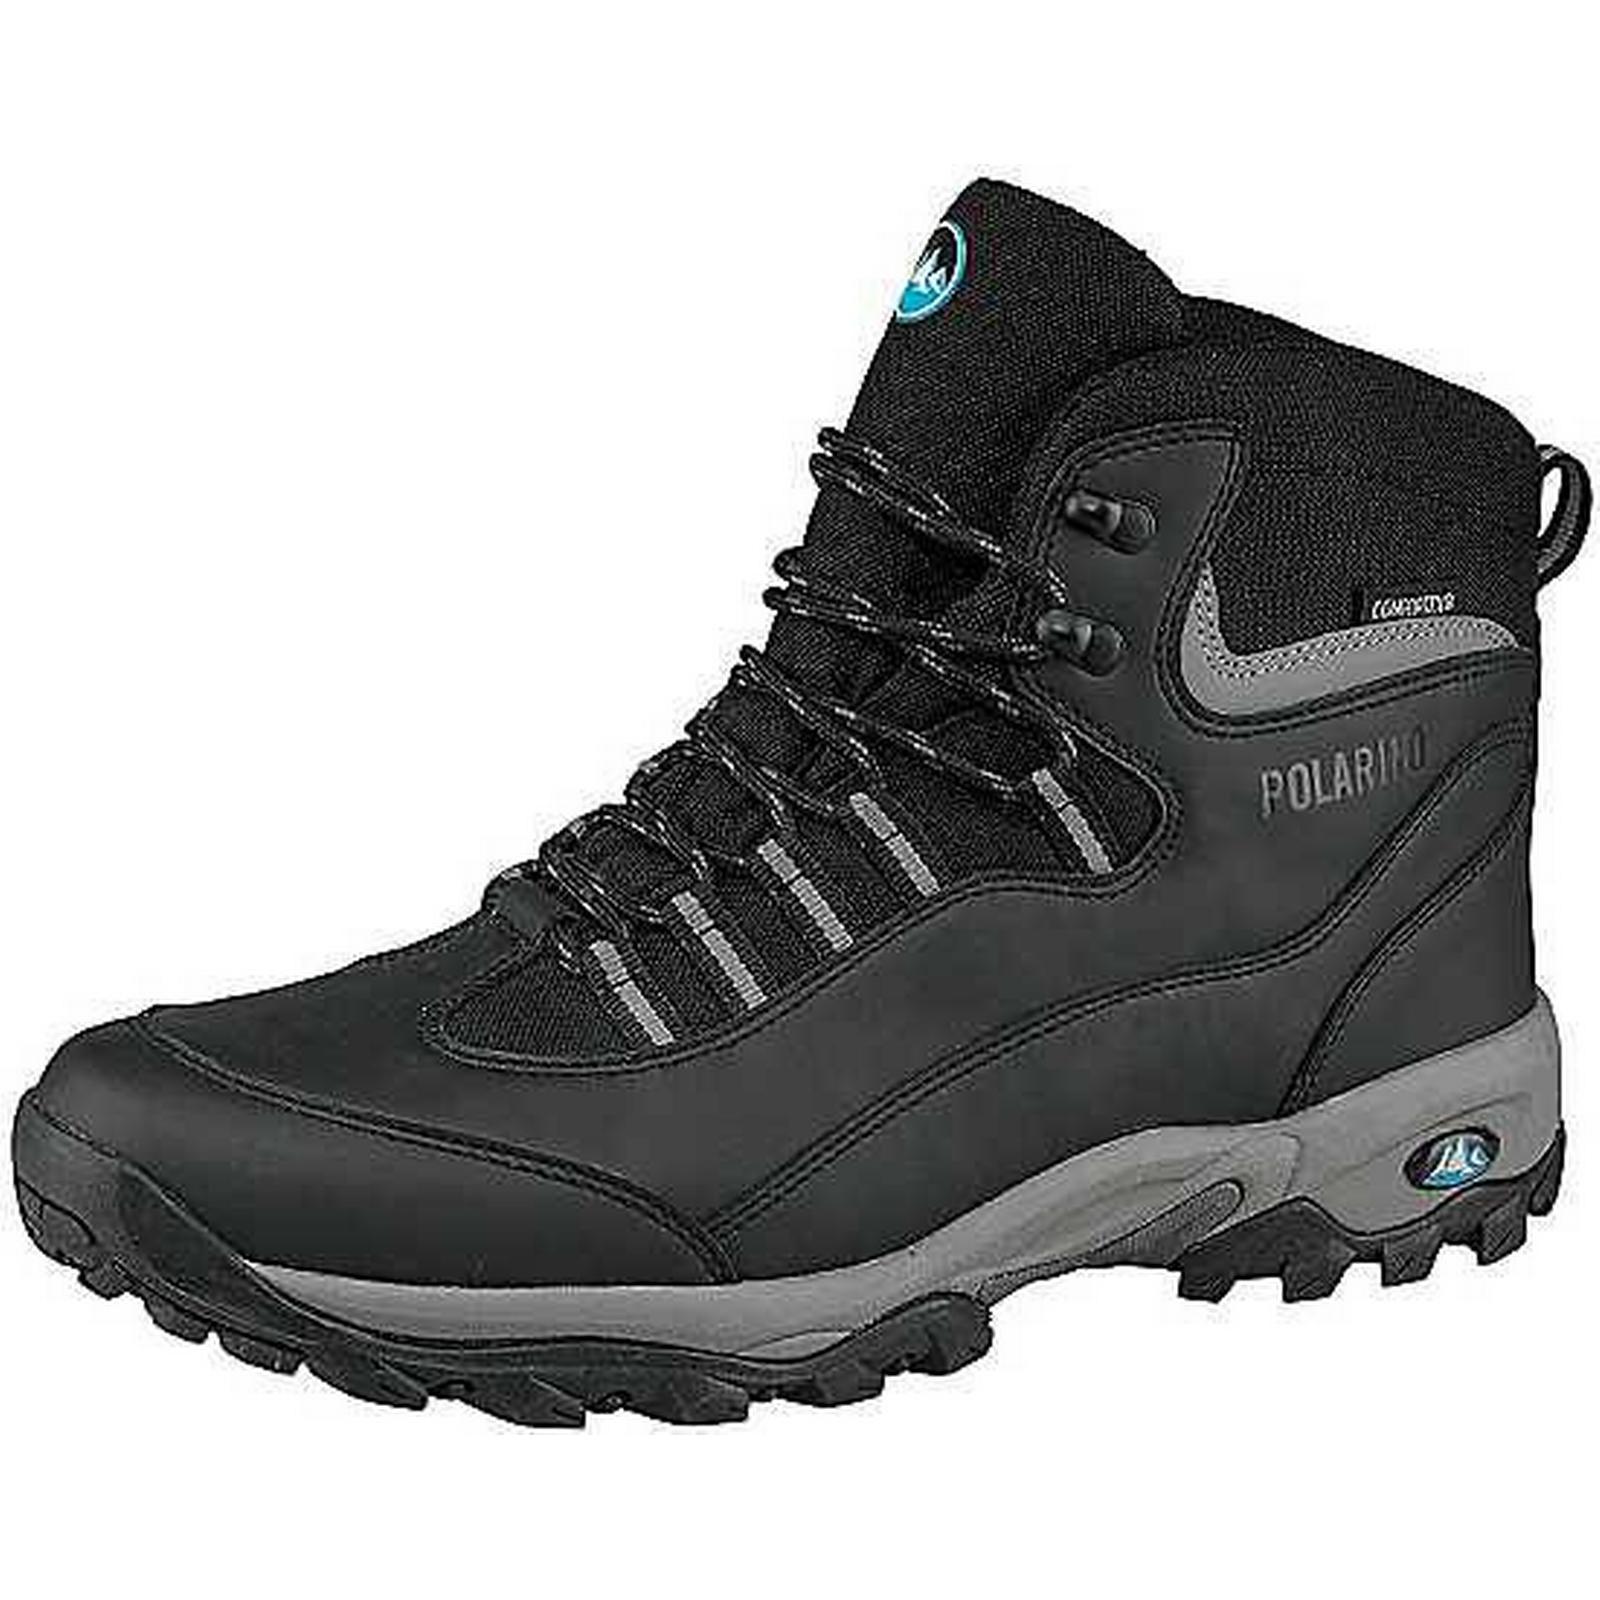 Polarino Boot Canada Outdoor by Shoes by Outdoor Polarino 0bcb1b